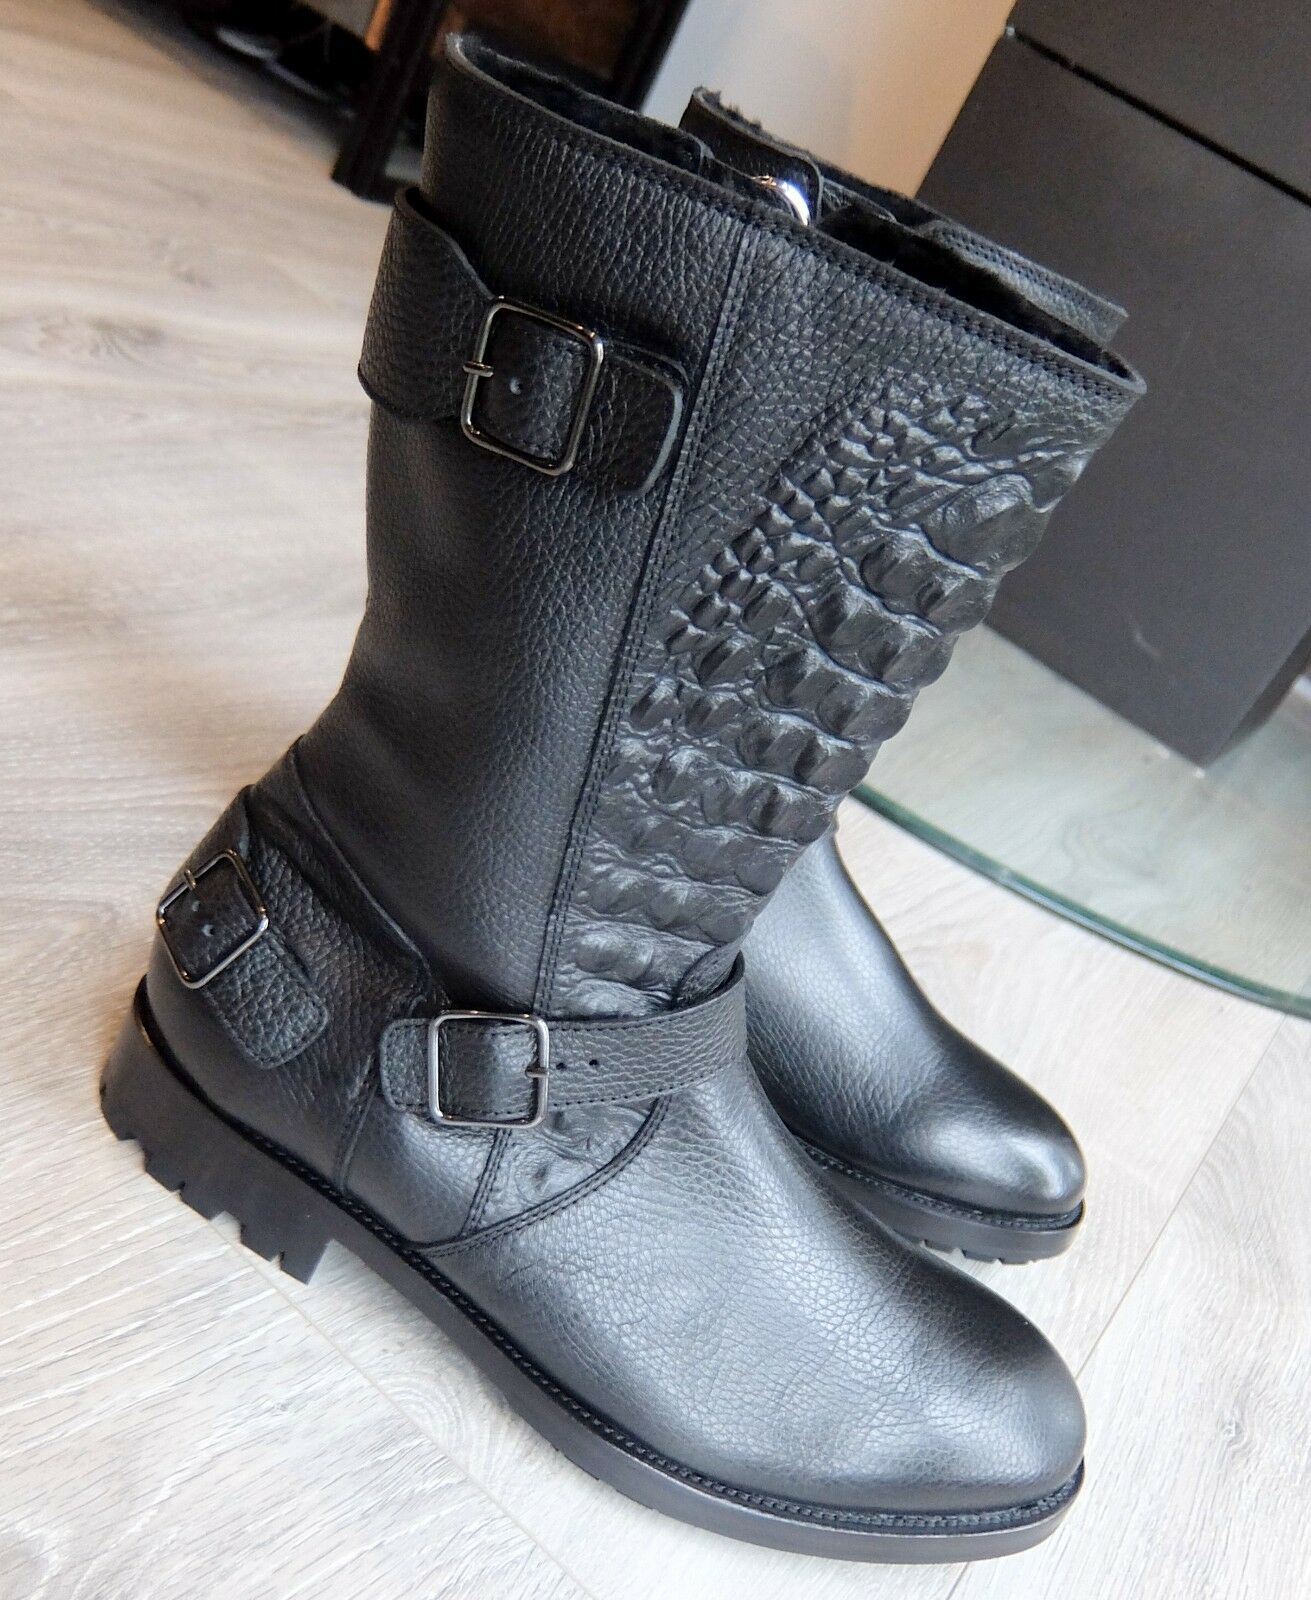 Philipp Plein botas 44 zapatos zapatos cuero Leather botas botas Croco chopard